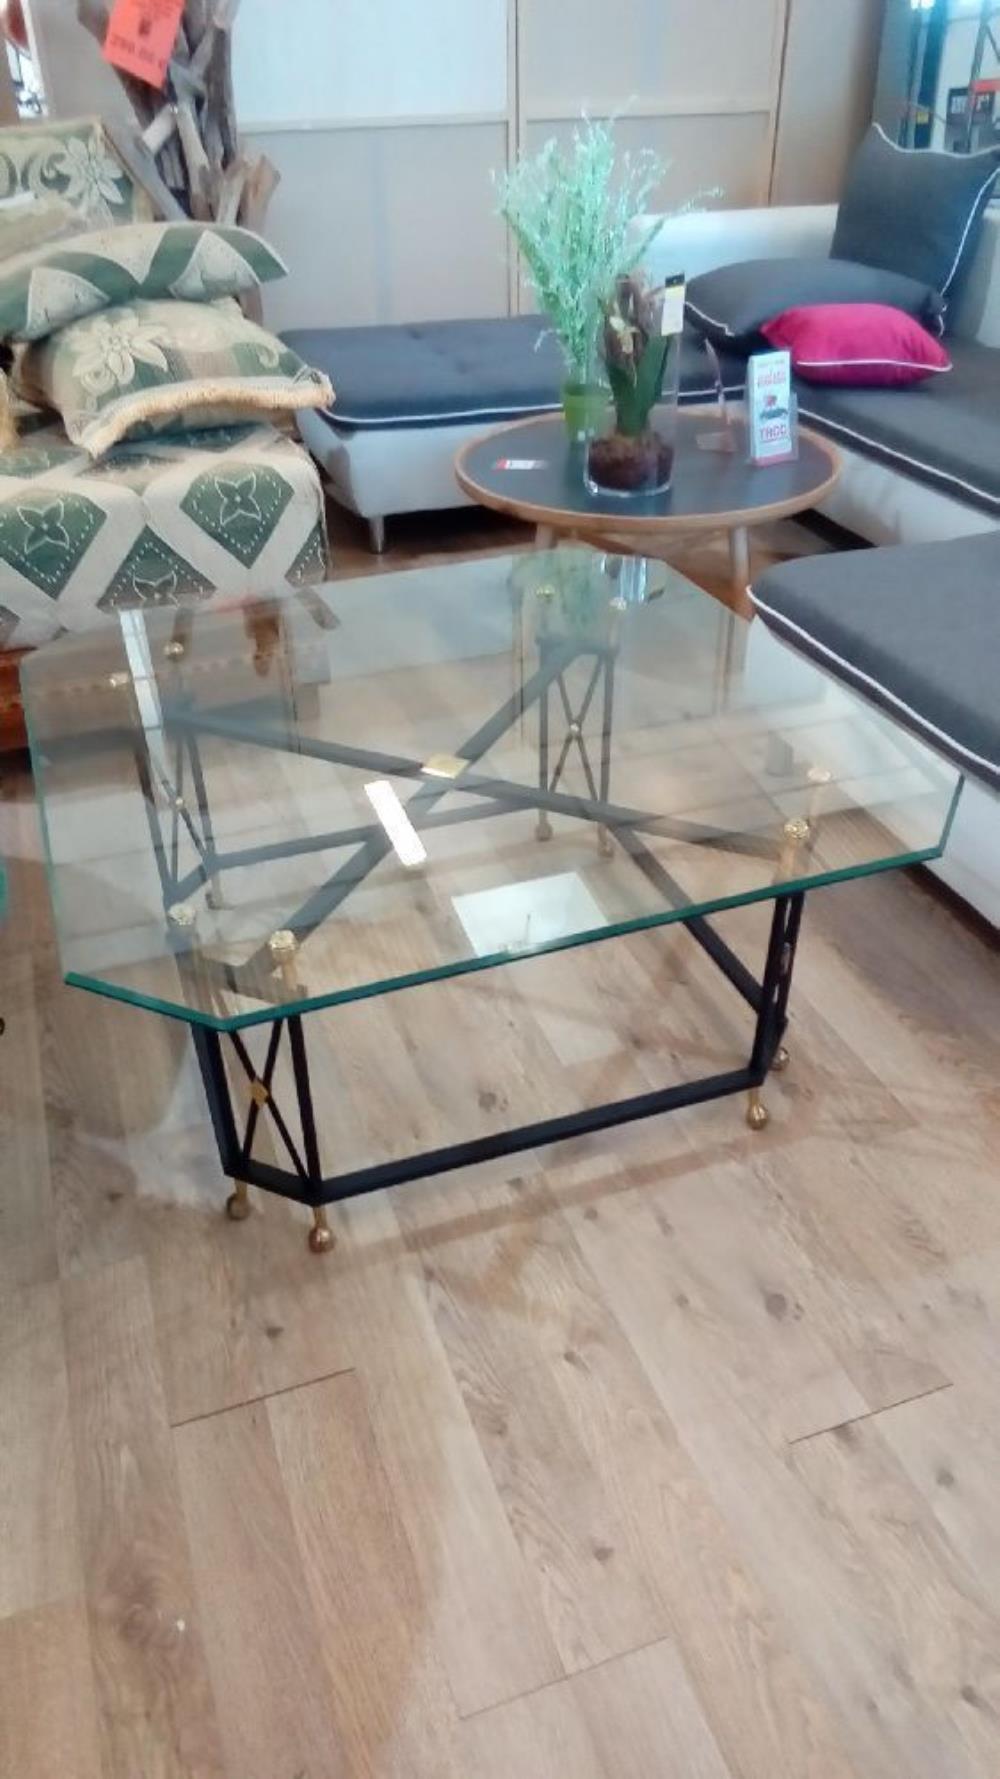 Table basse pied metal pl verre